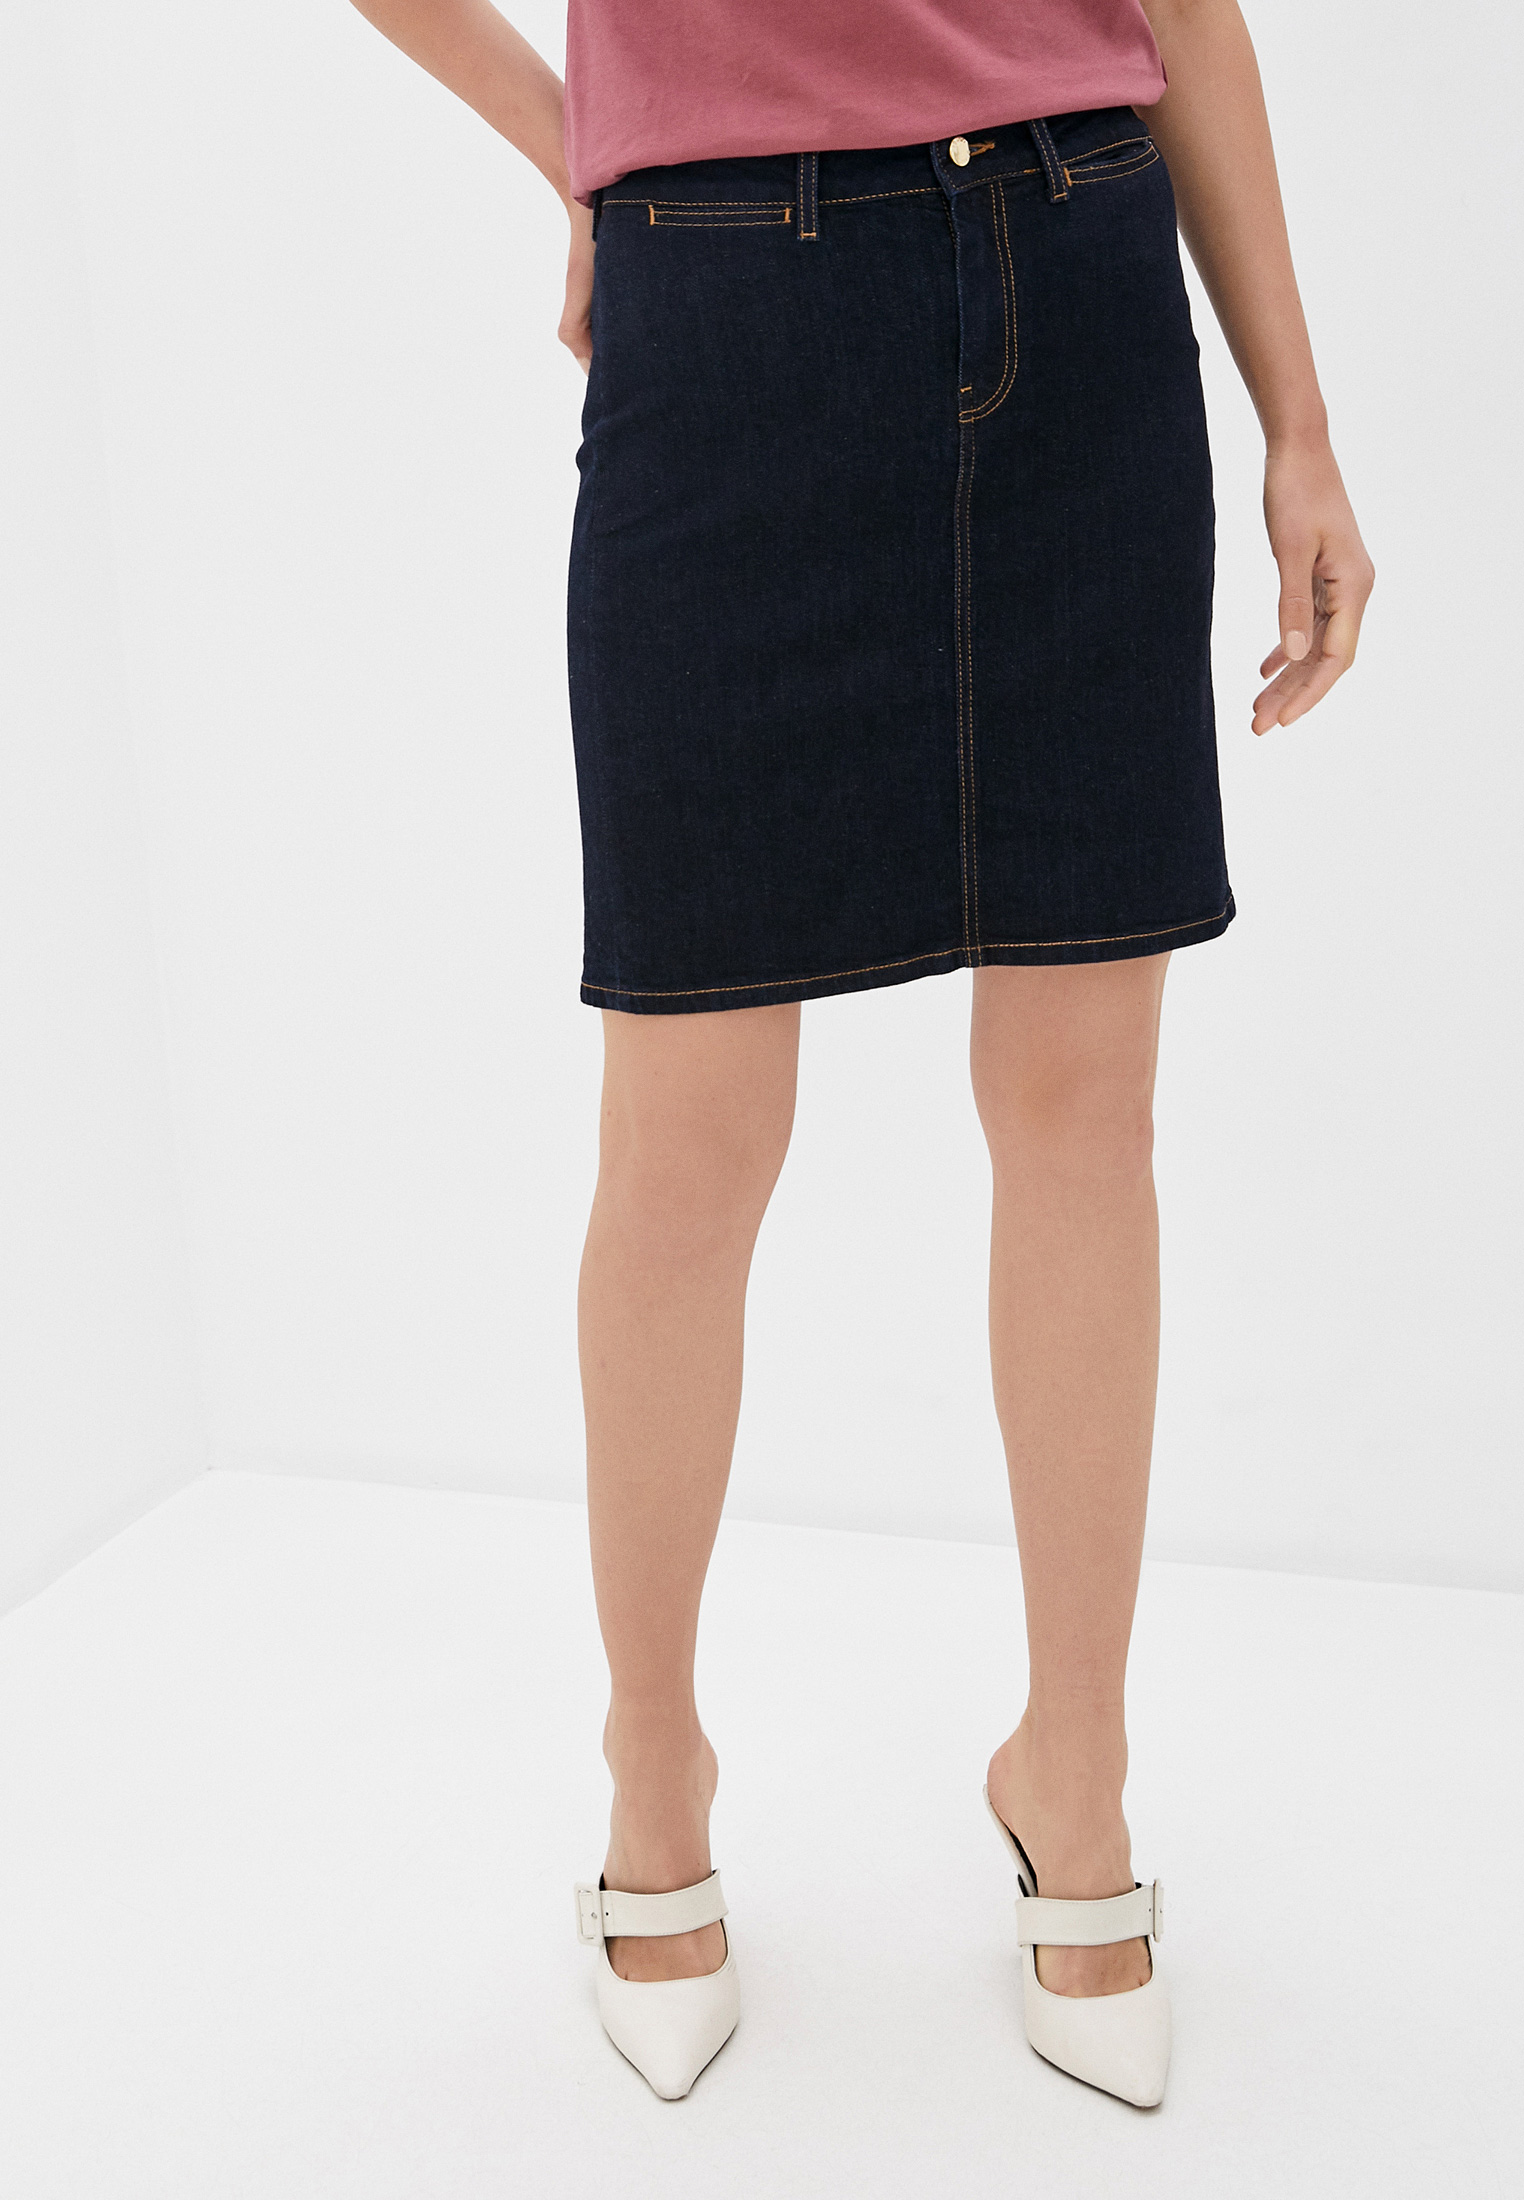 Джинсовая юбка Tommy Hilfiger (Томми Хилфигер) WW0WW28086